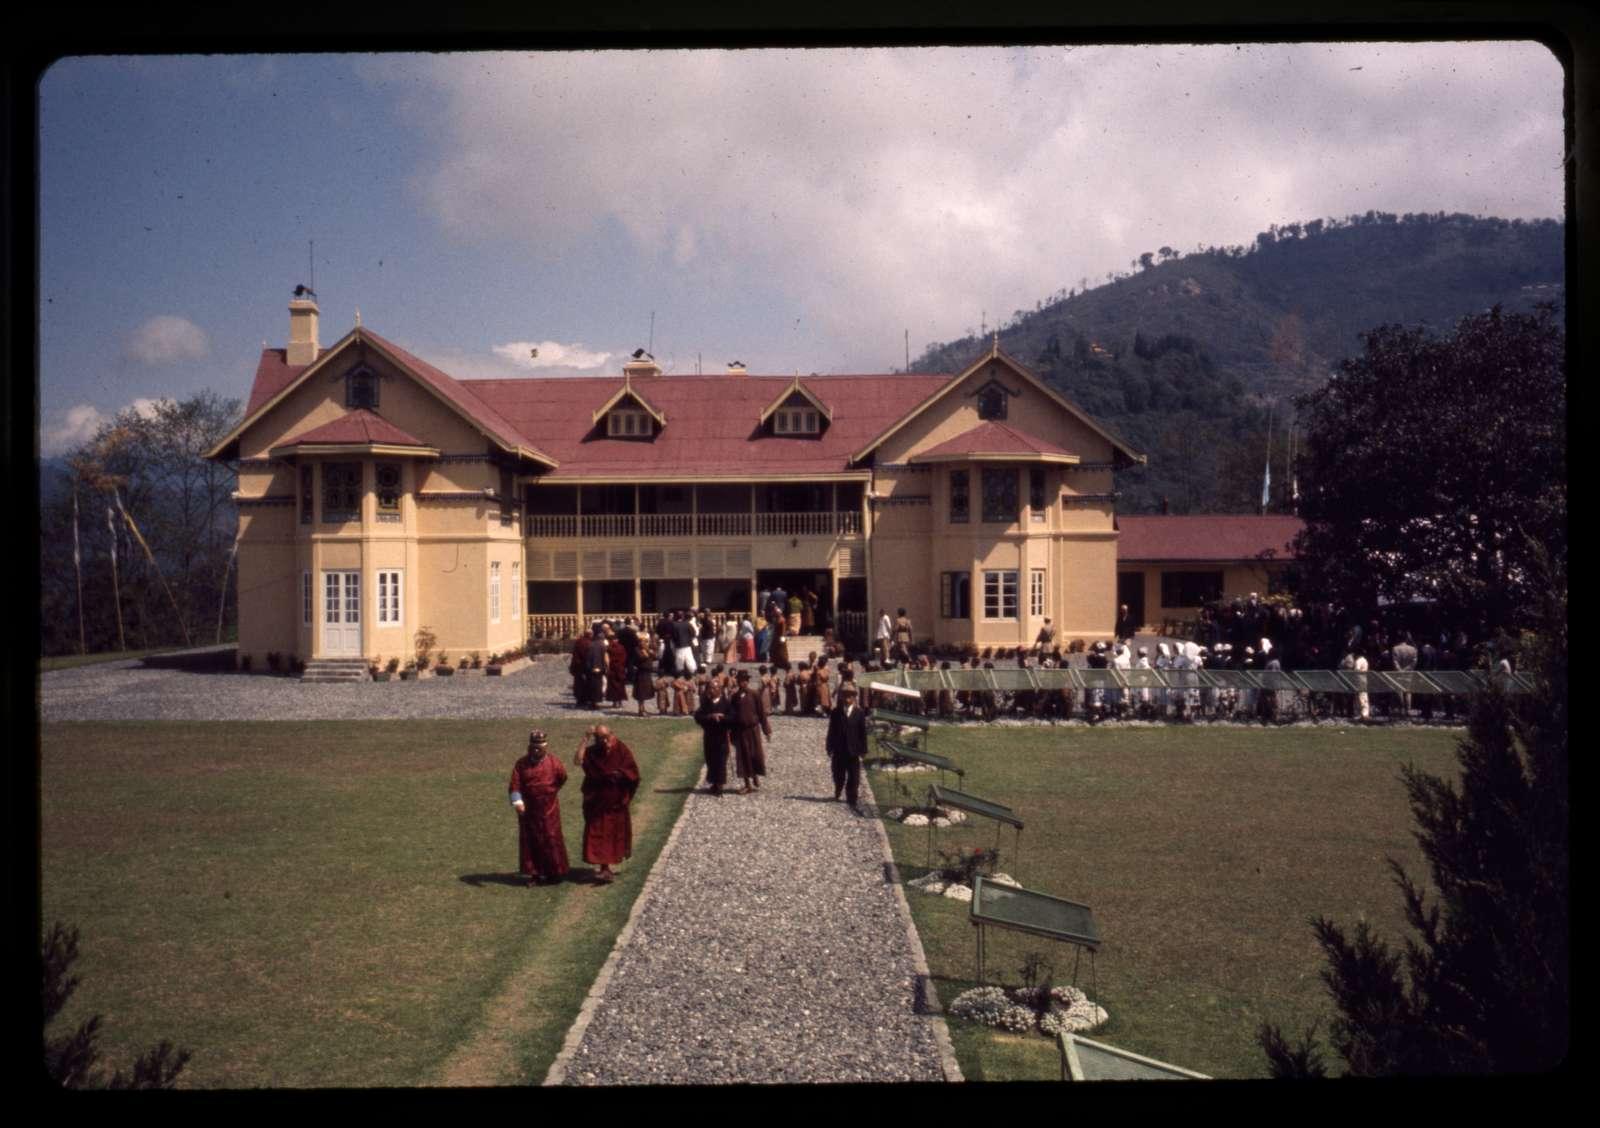 [Royal procession for Chogyal's birthday, Royal Palace, Gangtok, Sikkim]